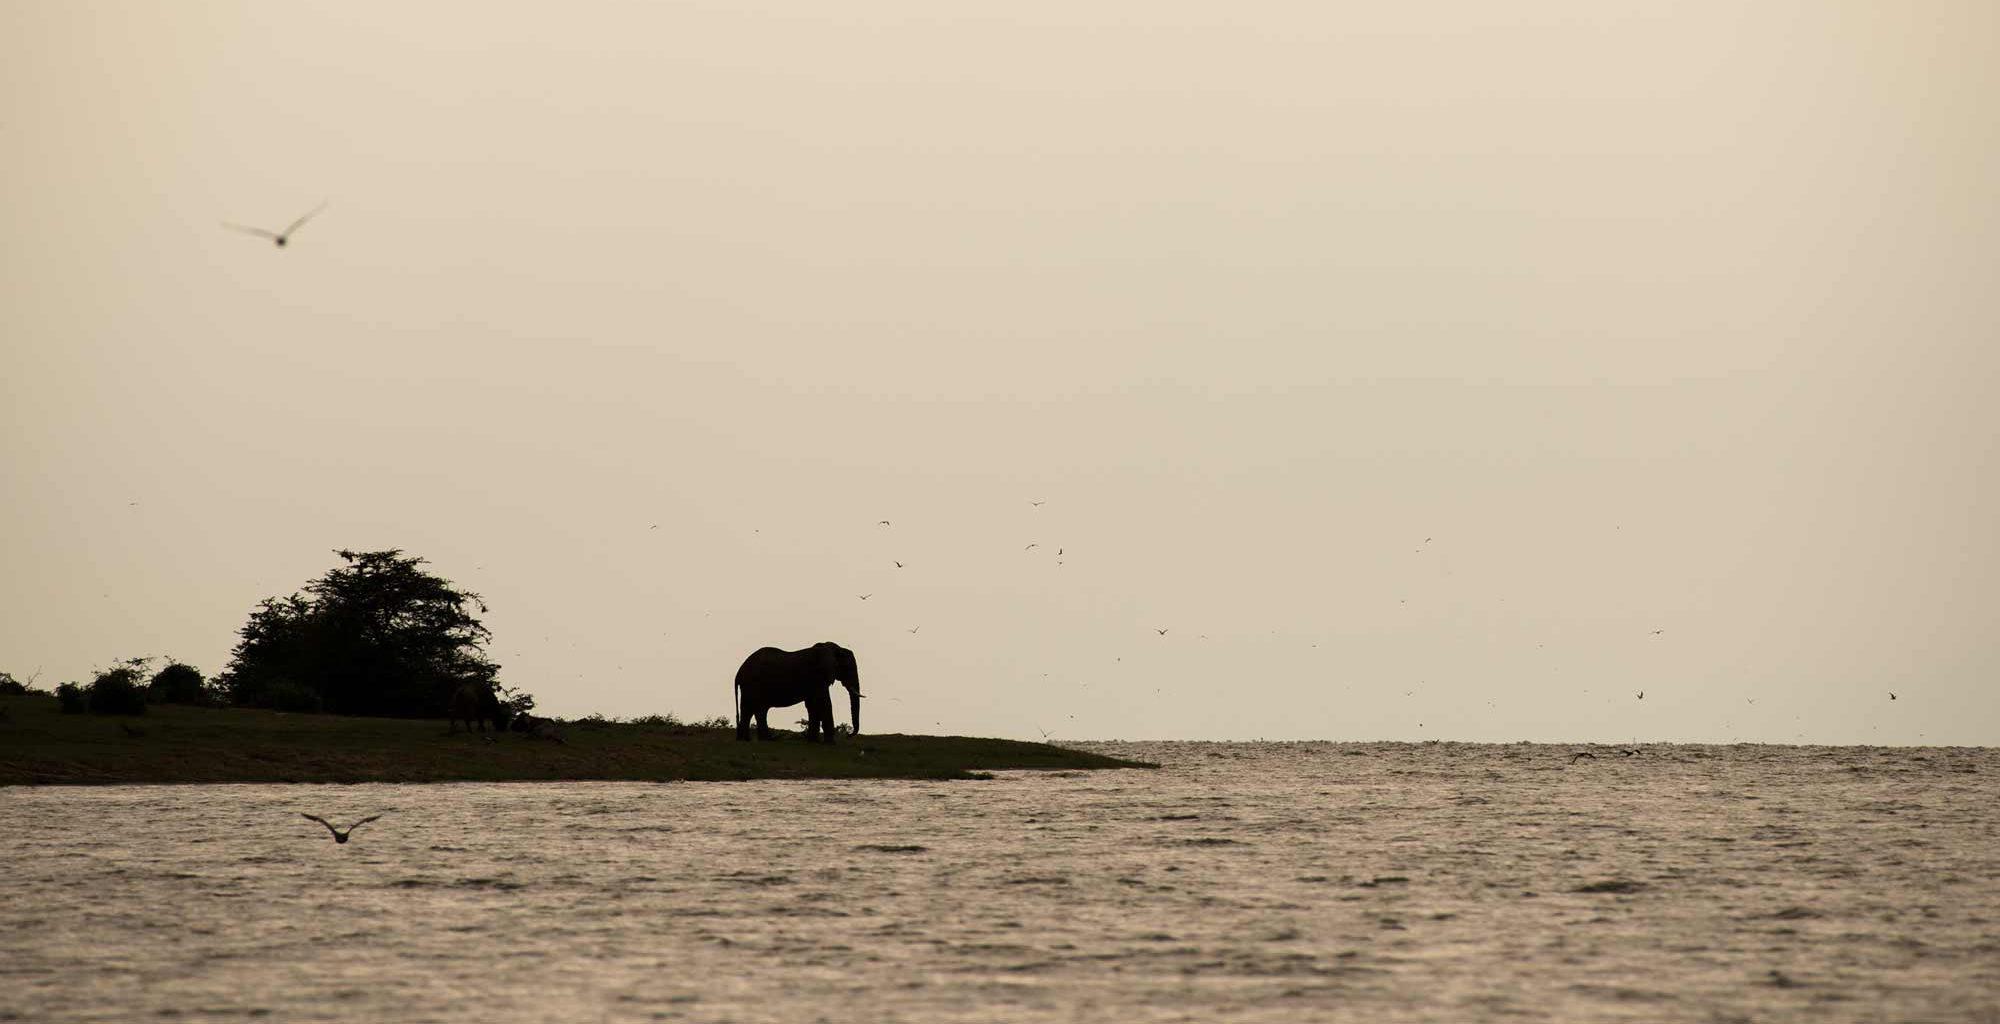 Uganda-Queen-Elizabeth-National-Park-Wildlife-Elephant